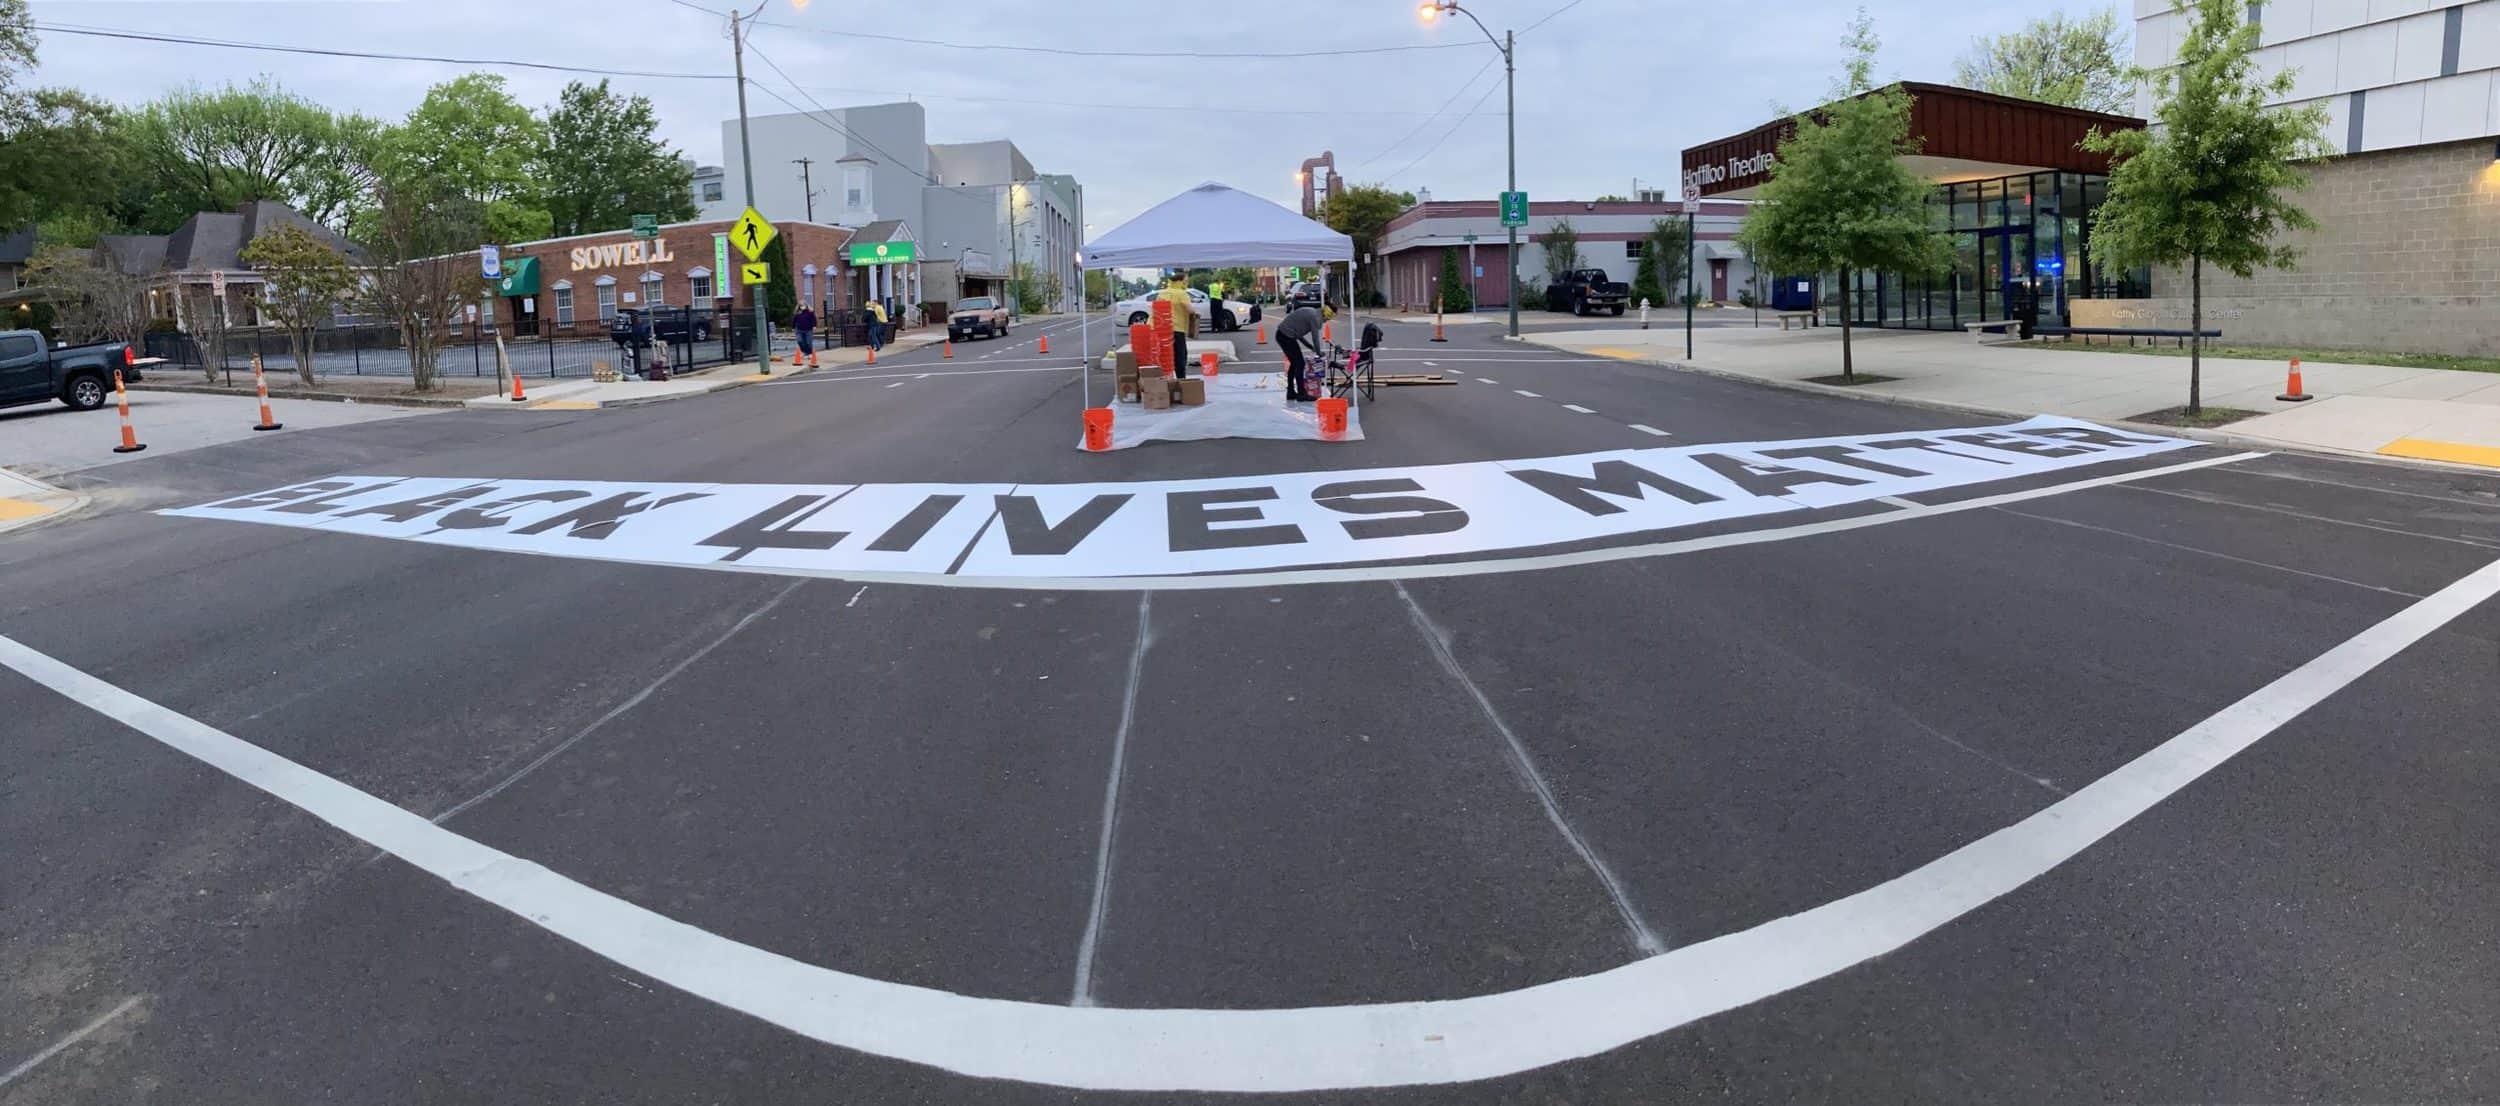 The team began working on the crosswalks before dawn.